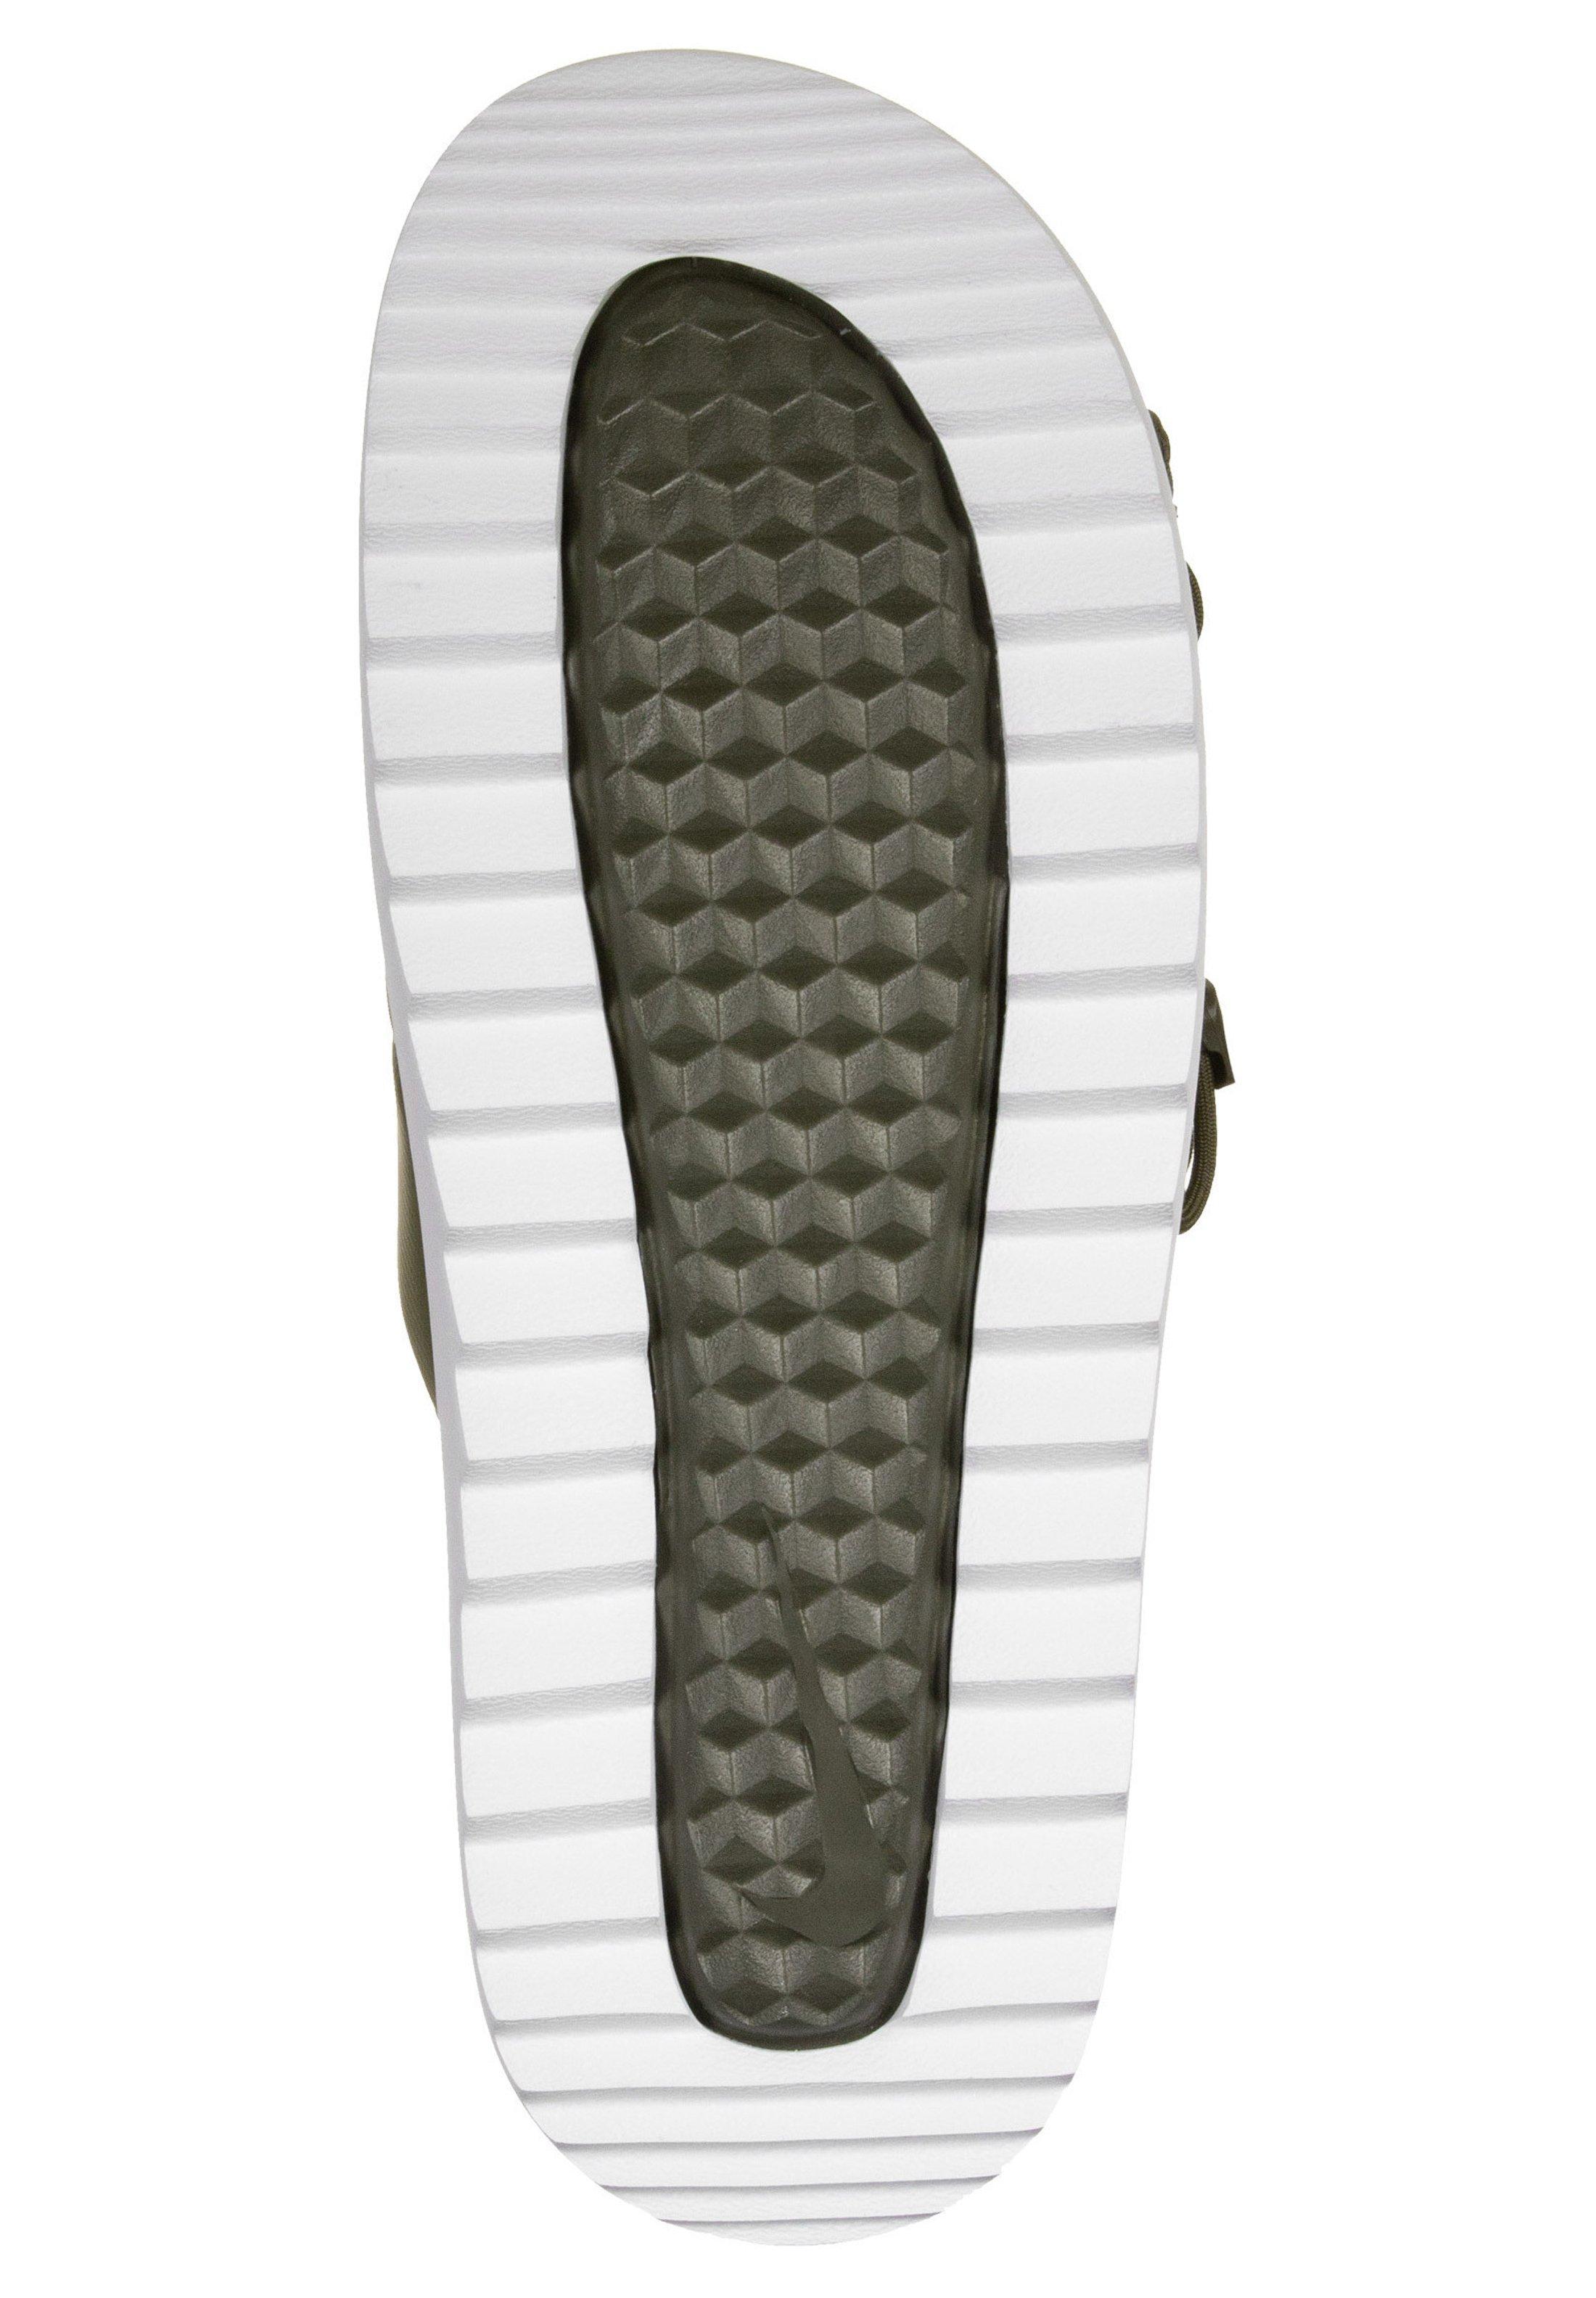 Nike Sportswear CITY - Badesandale - cargo khaki/light cream/oliv - Herrenschuhe UsPHN